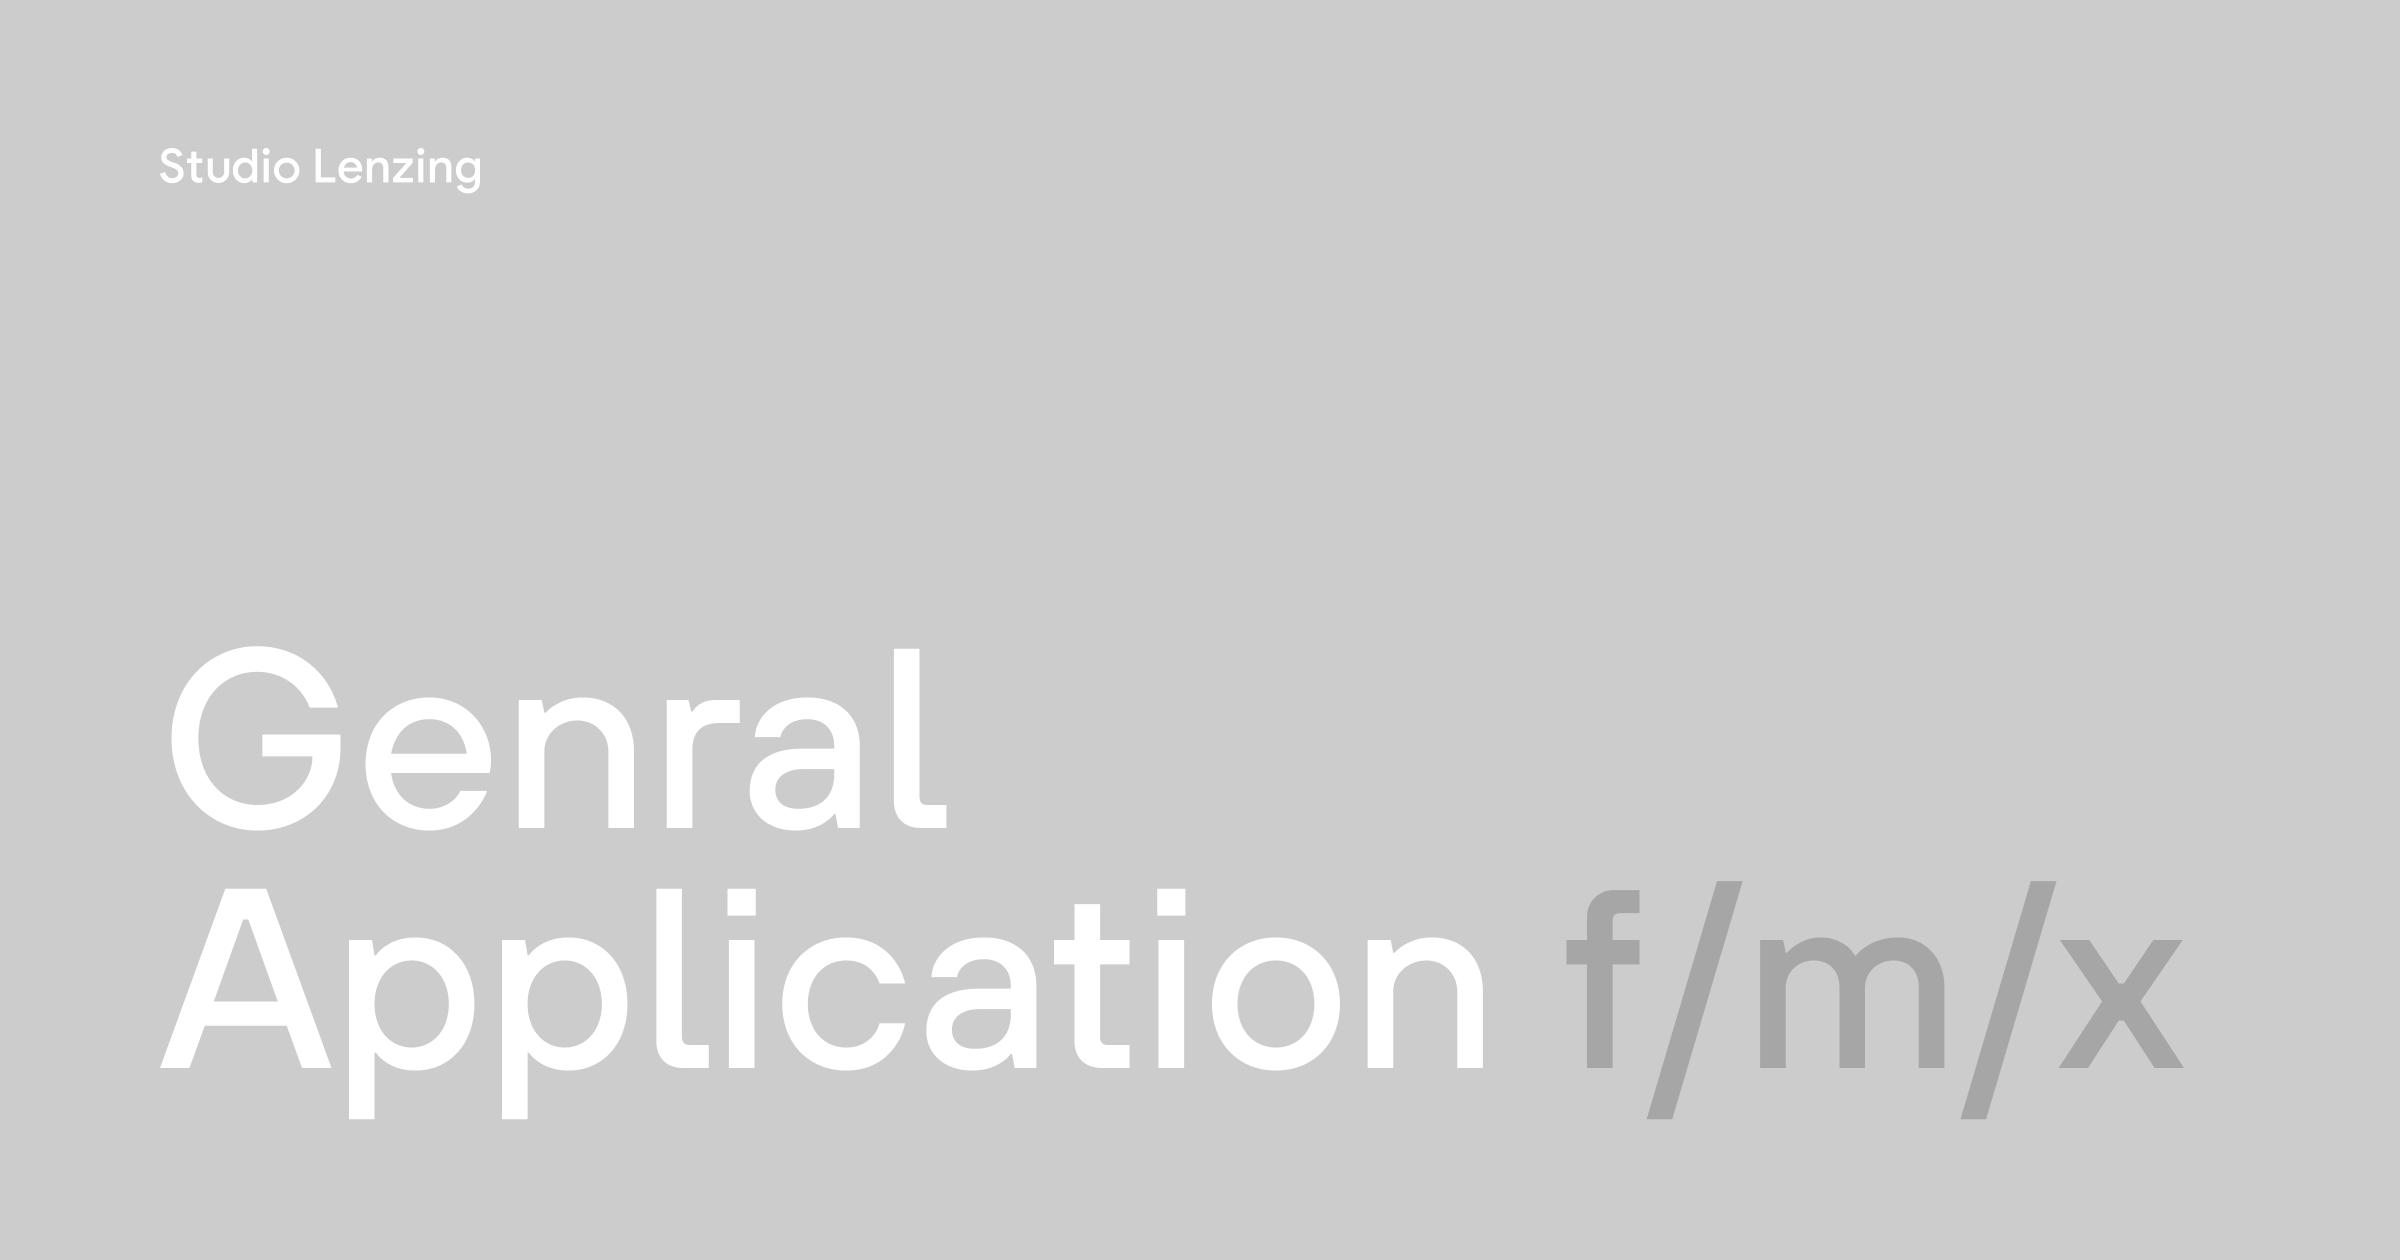 General Application